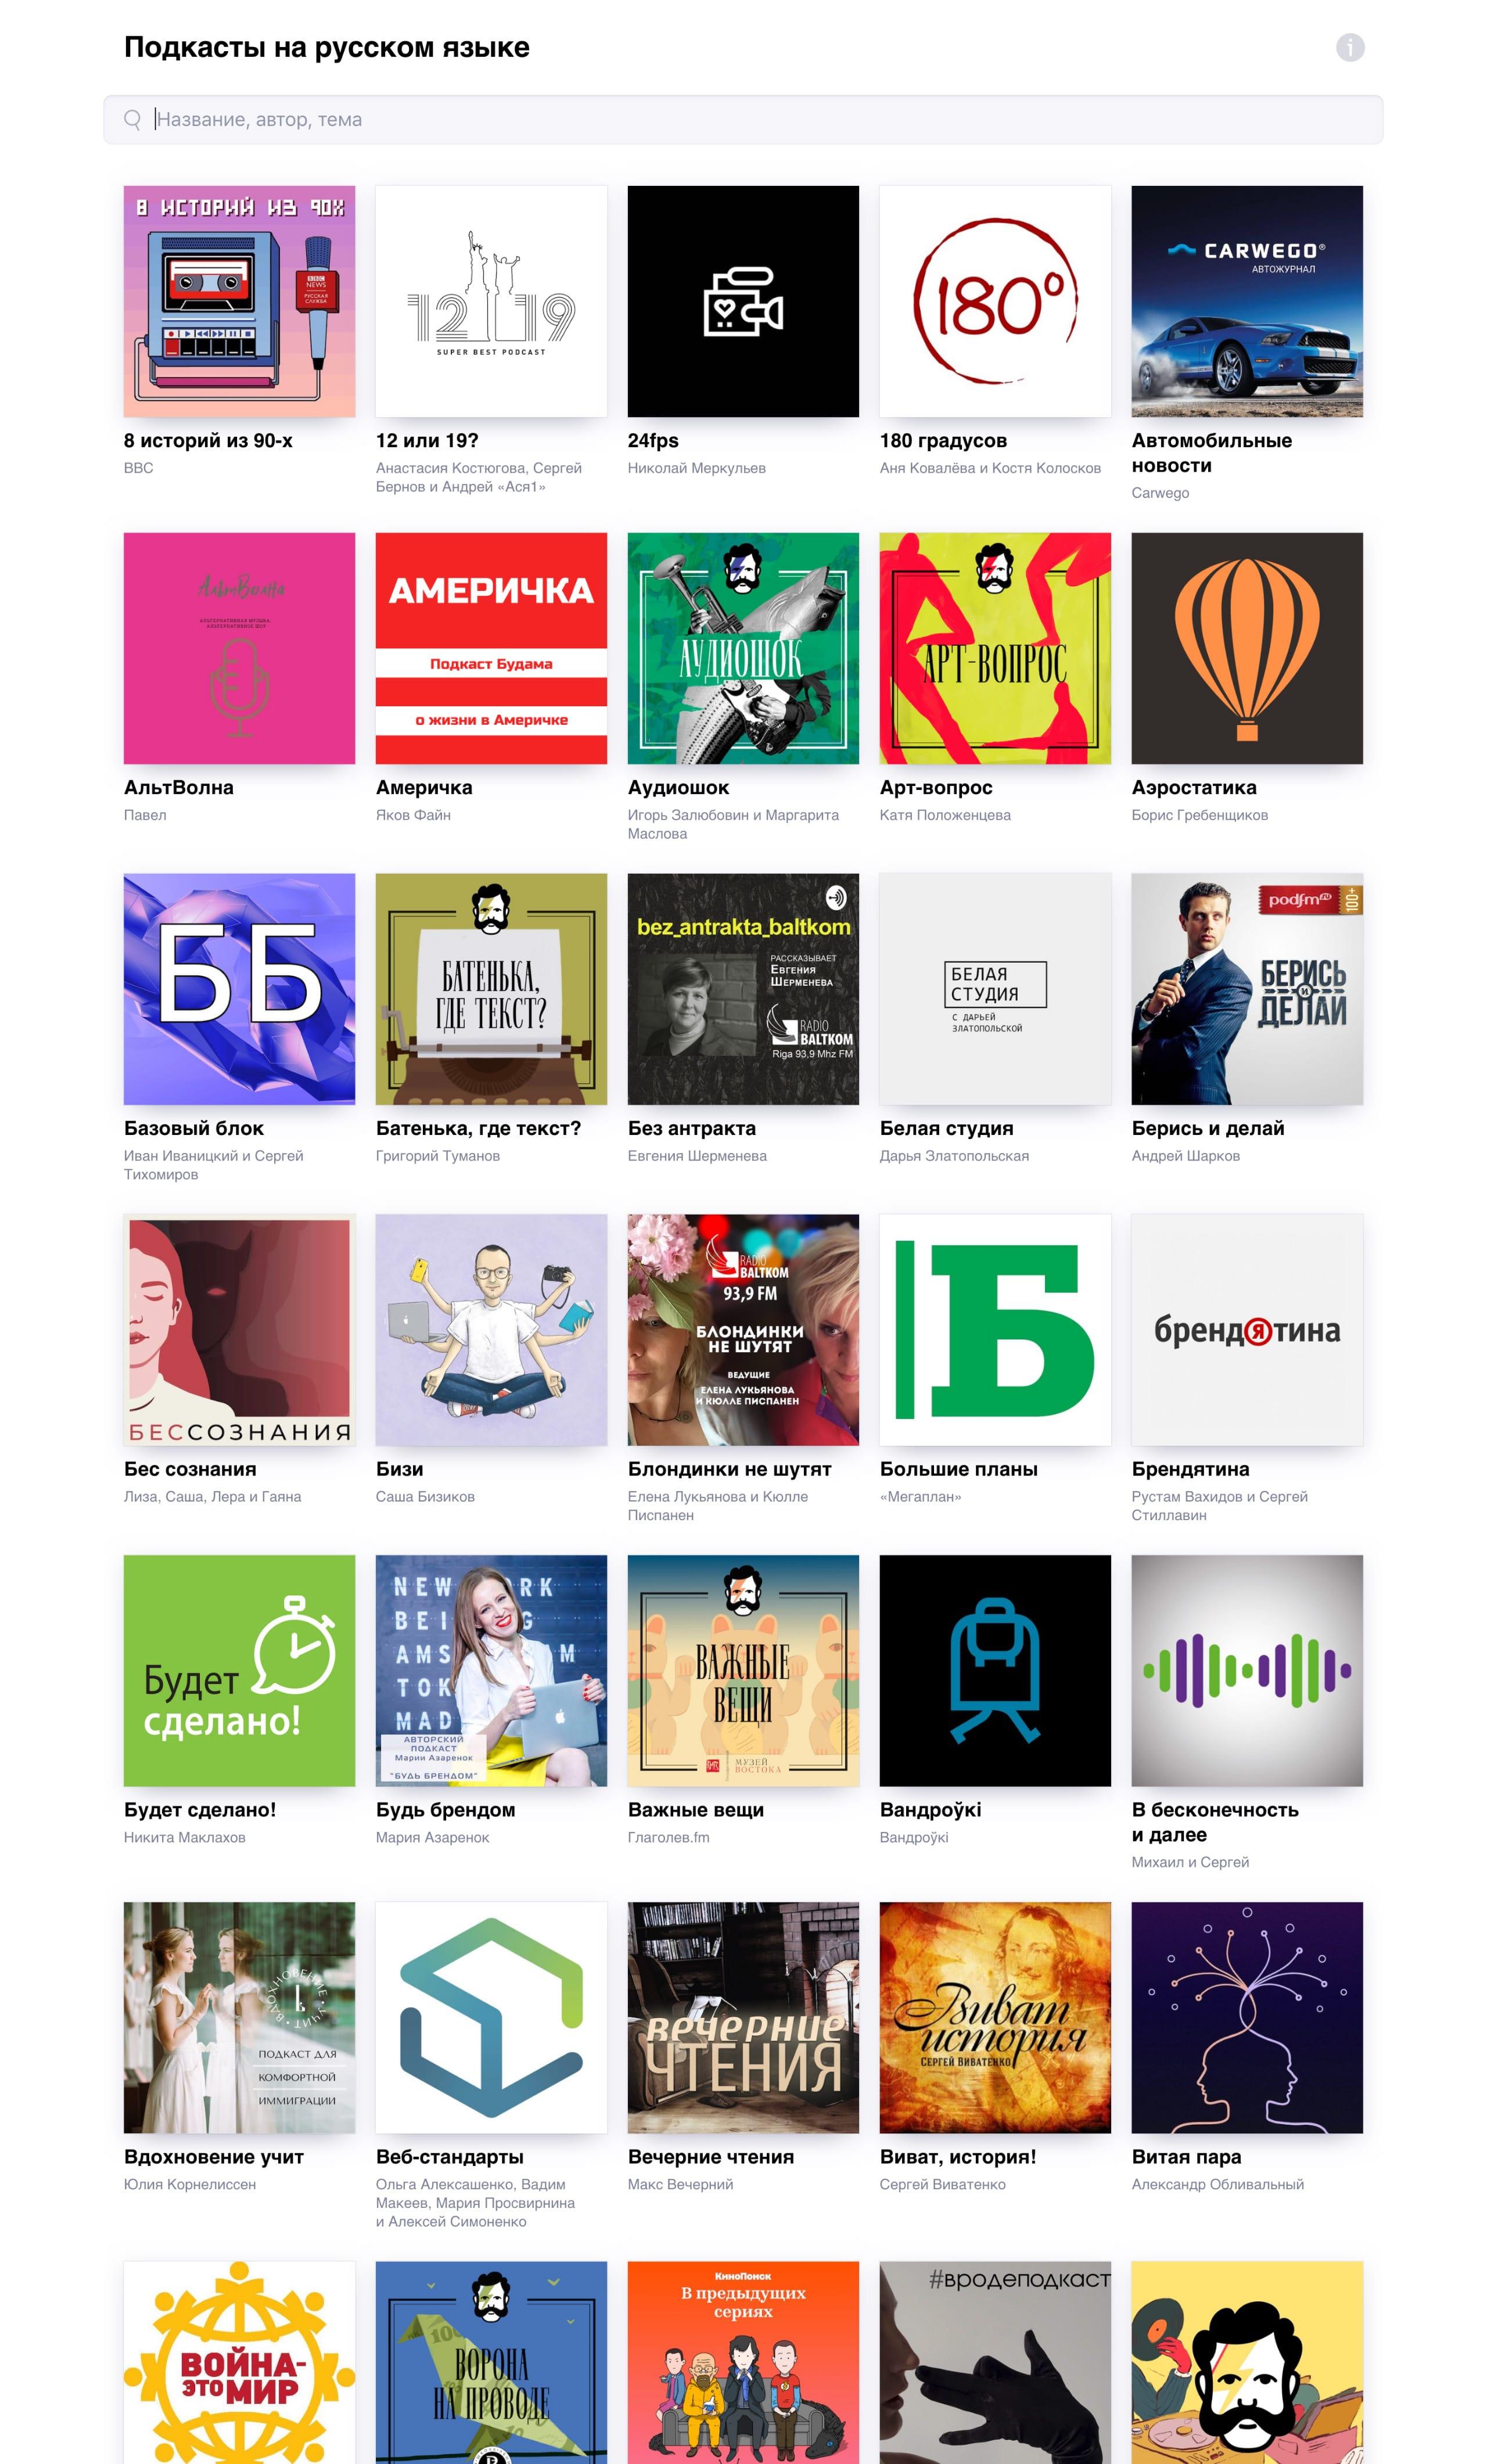 Russian Podcasts Website Screenshot